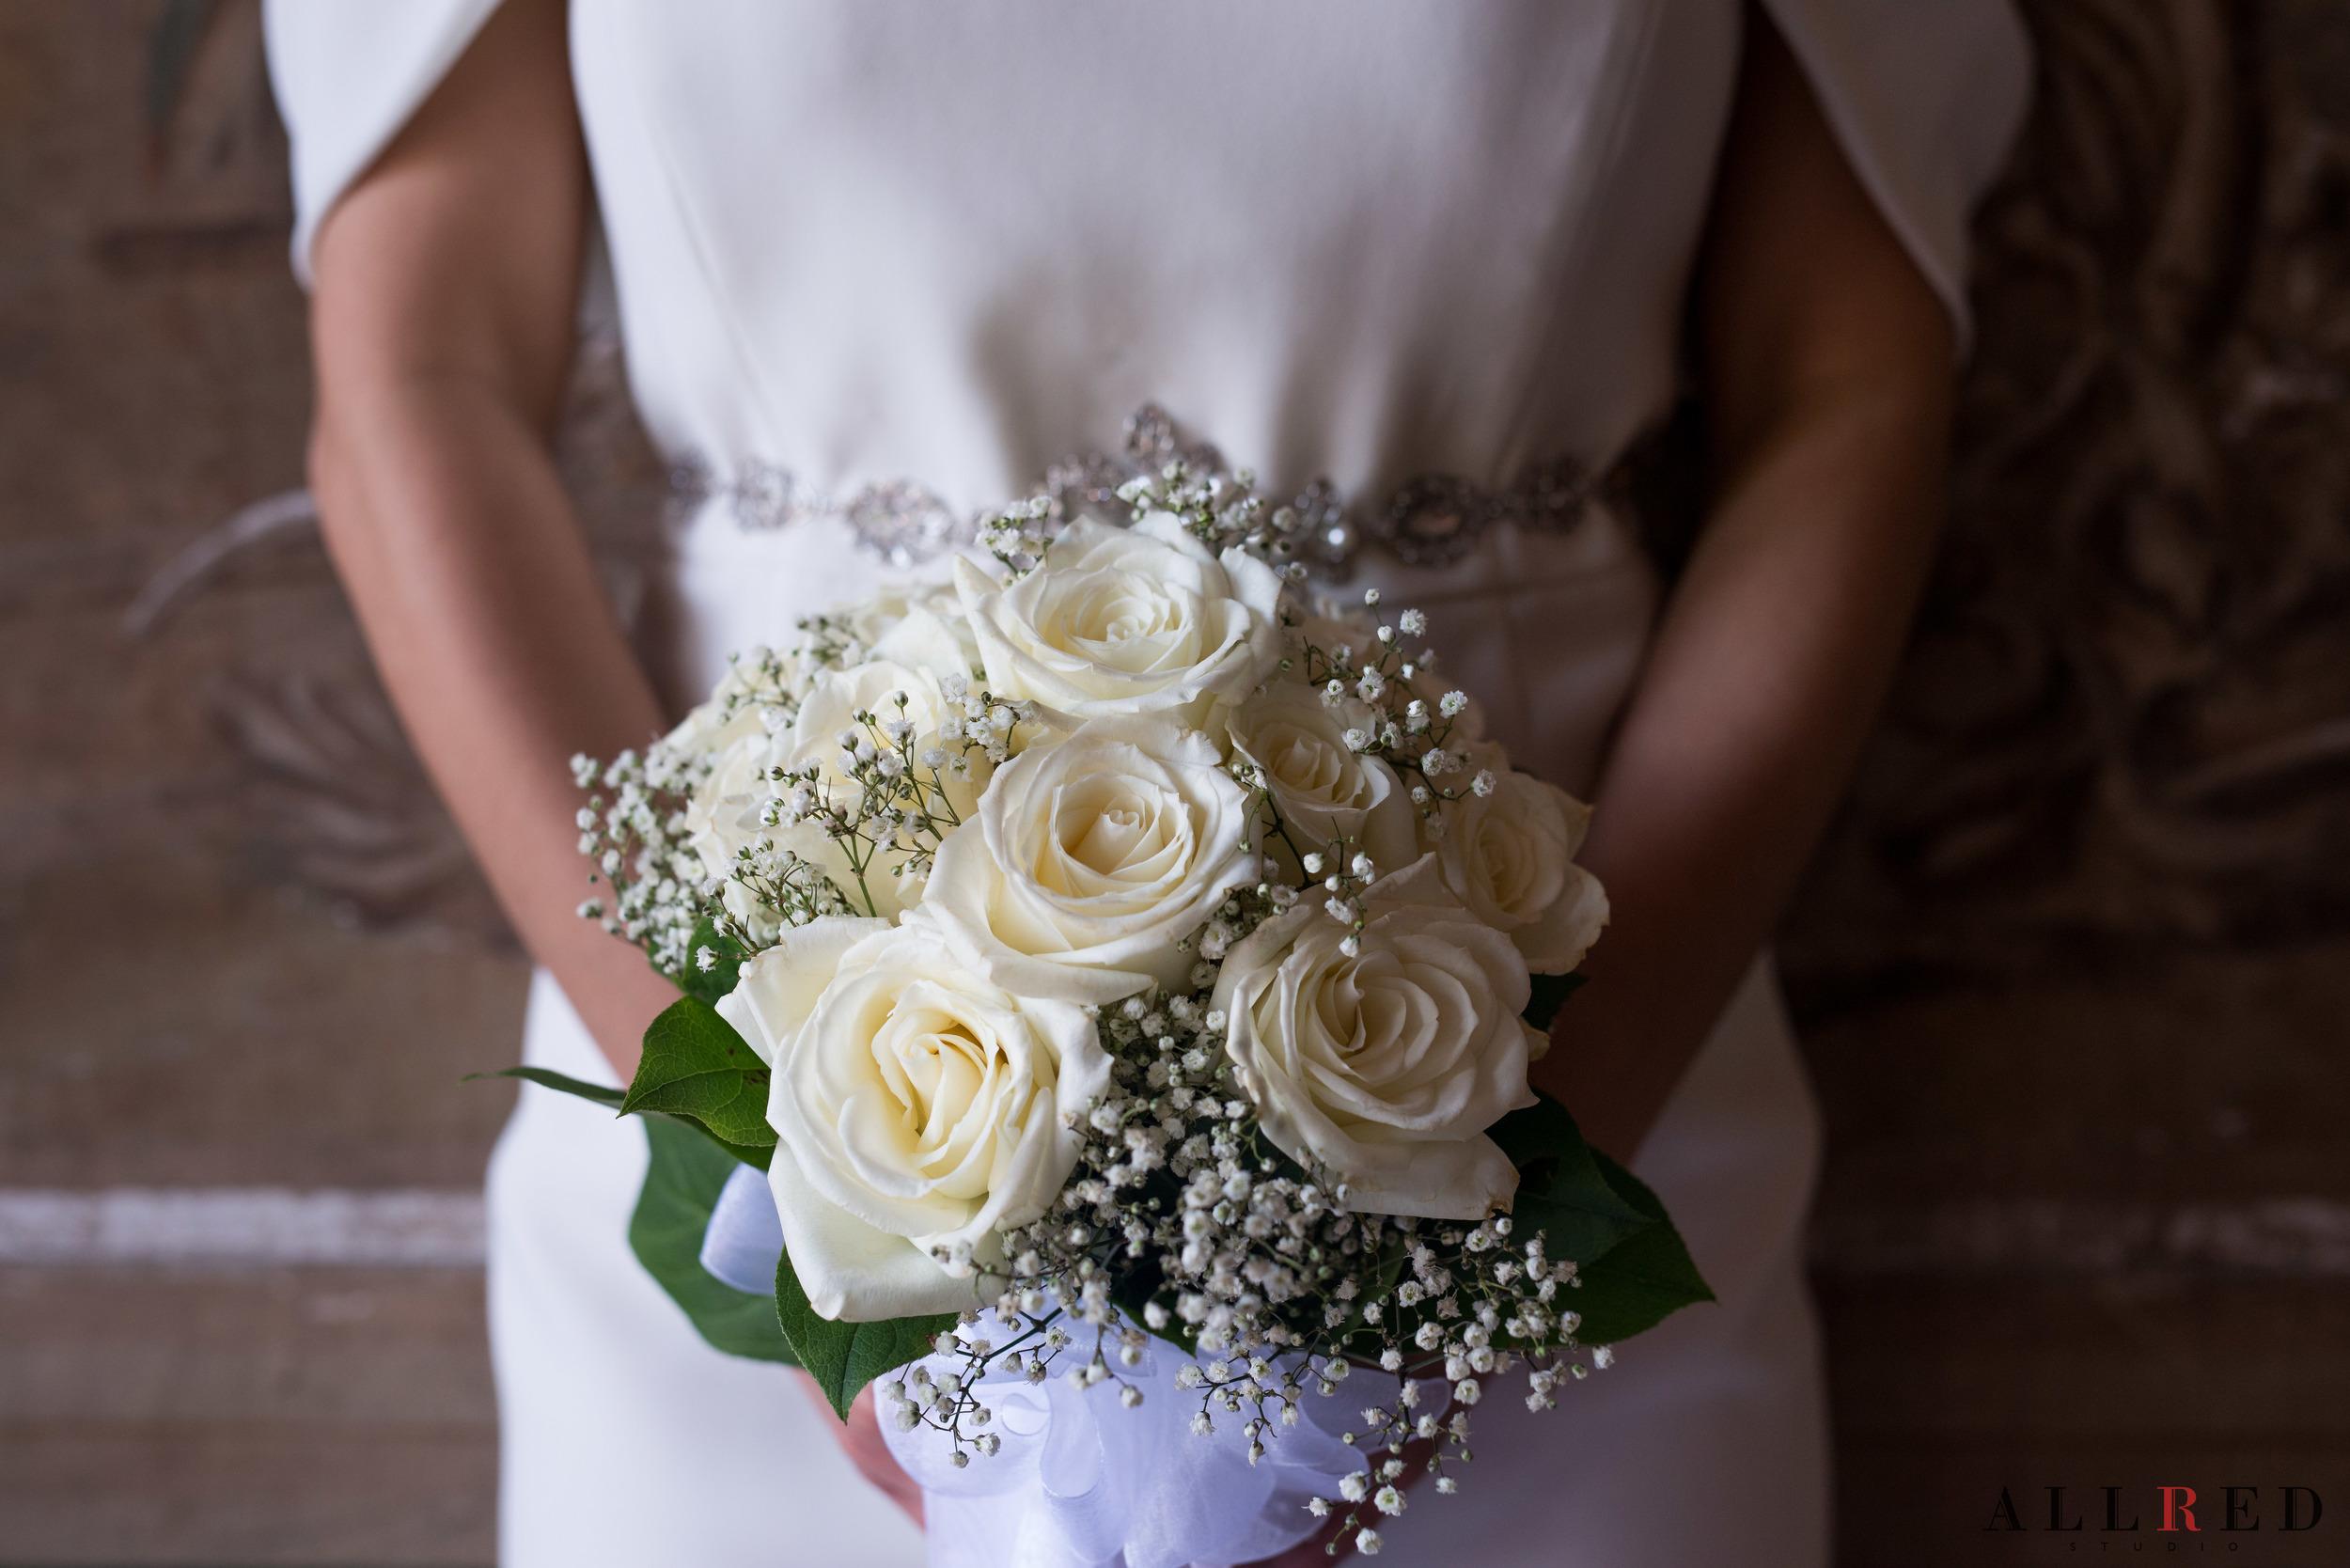 Wedding-central-park-allred-studio-new-york-photographer-new-jersey-hudson-valley-2671.jpg